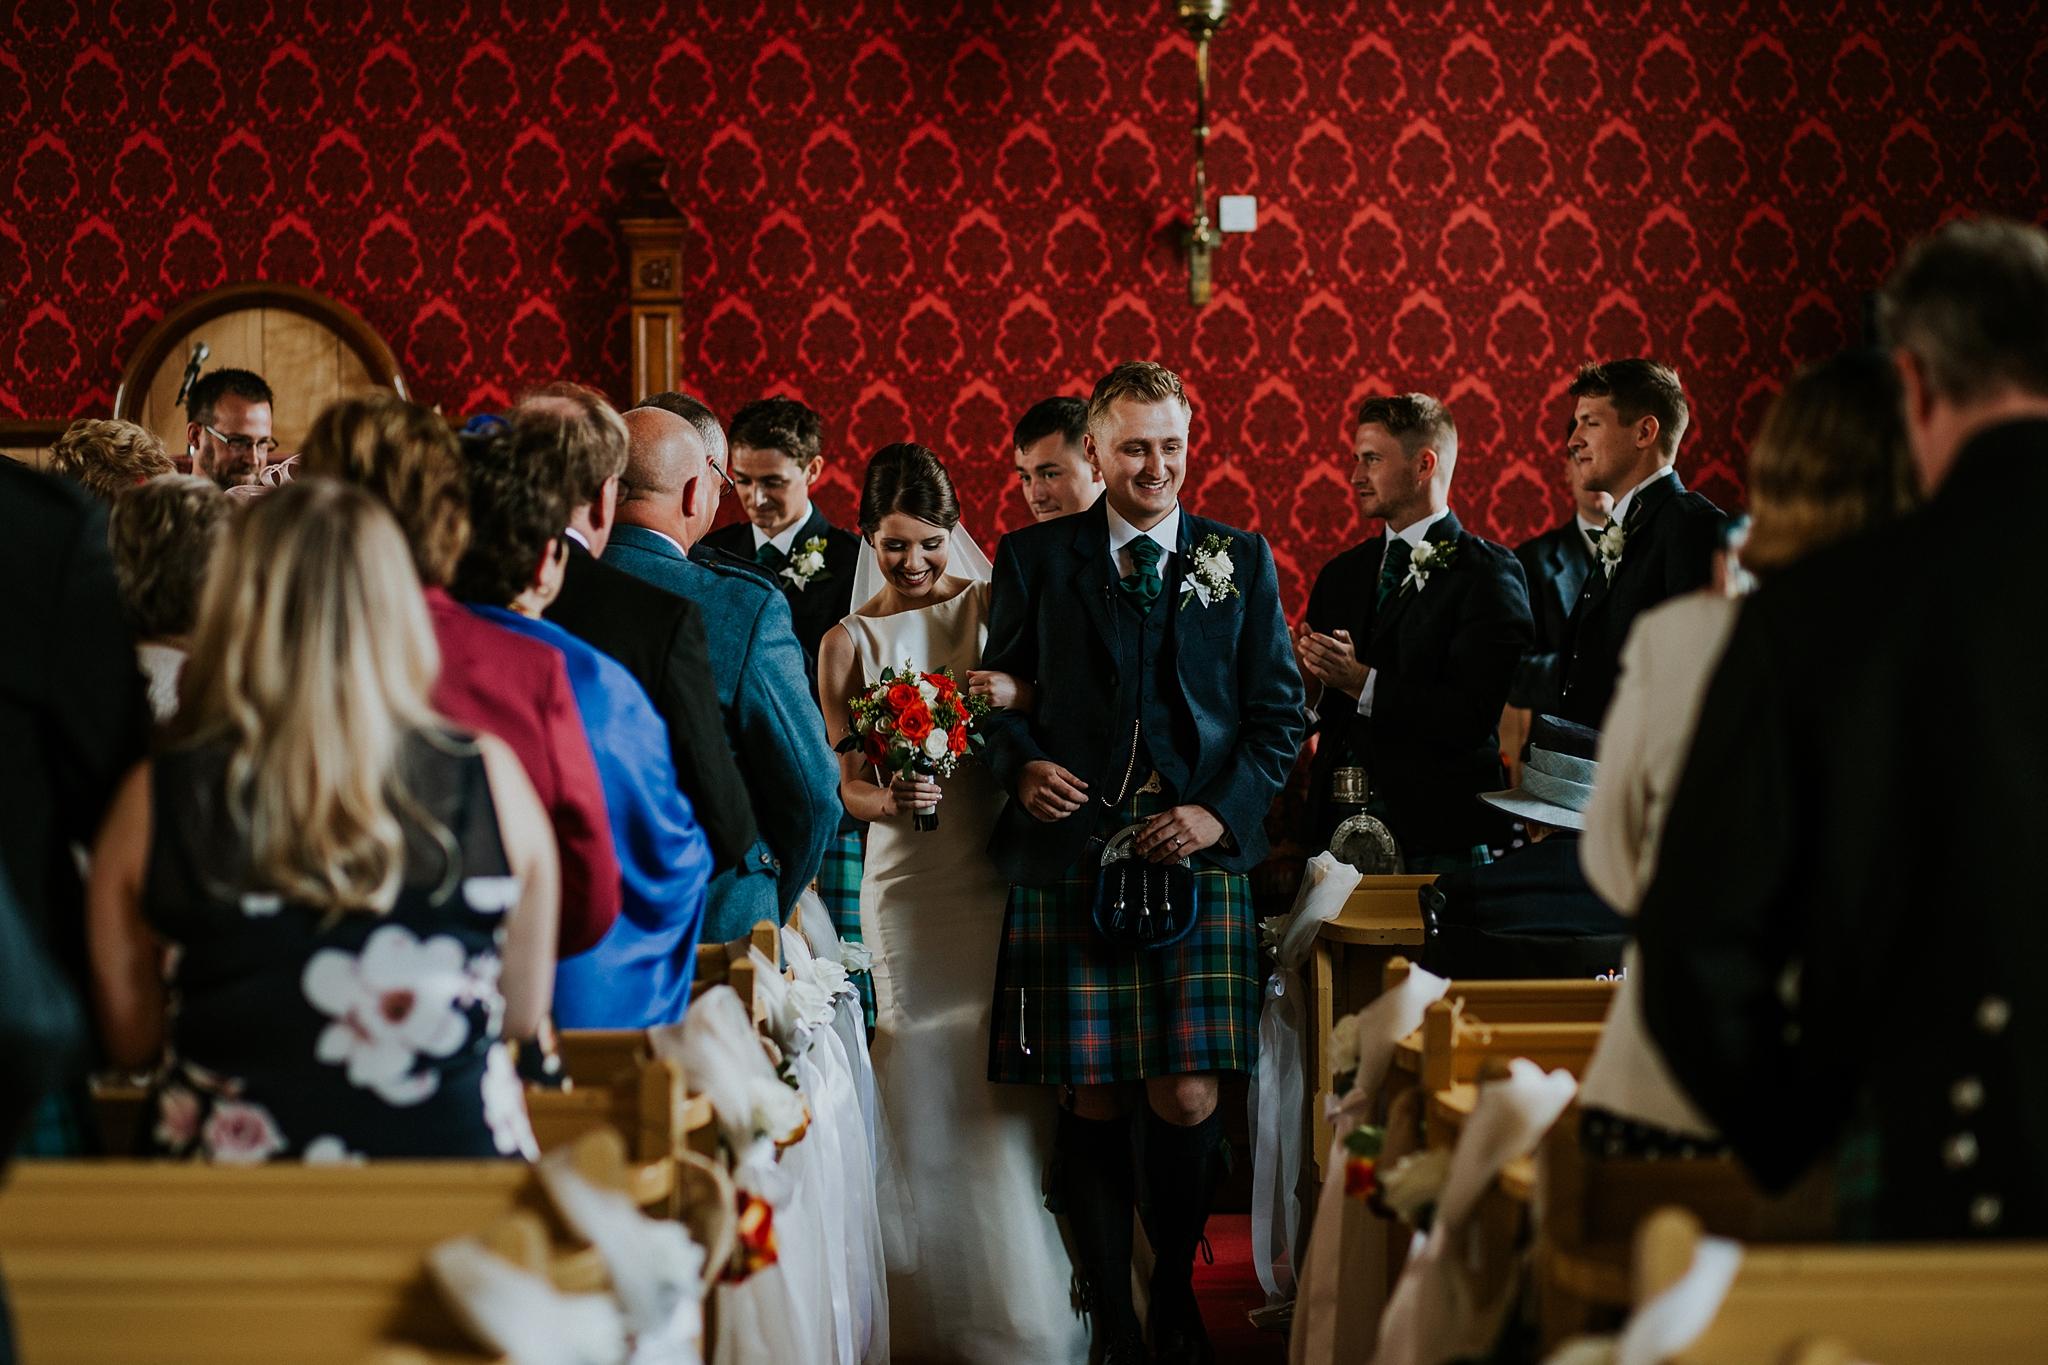 Linda&Shockie_northuist_wedding_photographer-24.JPG